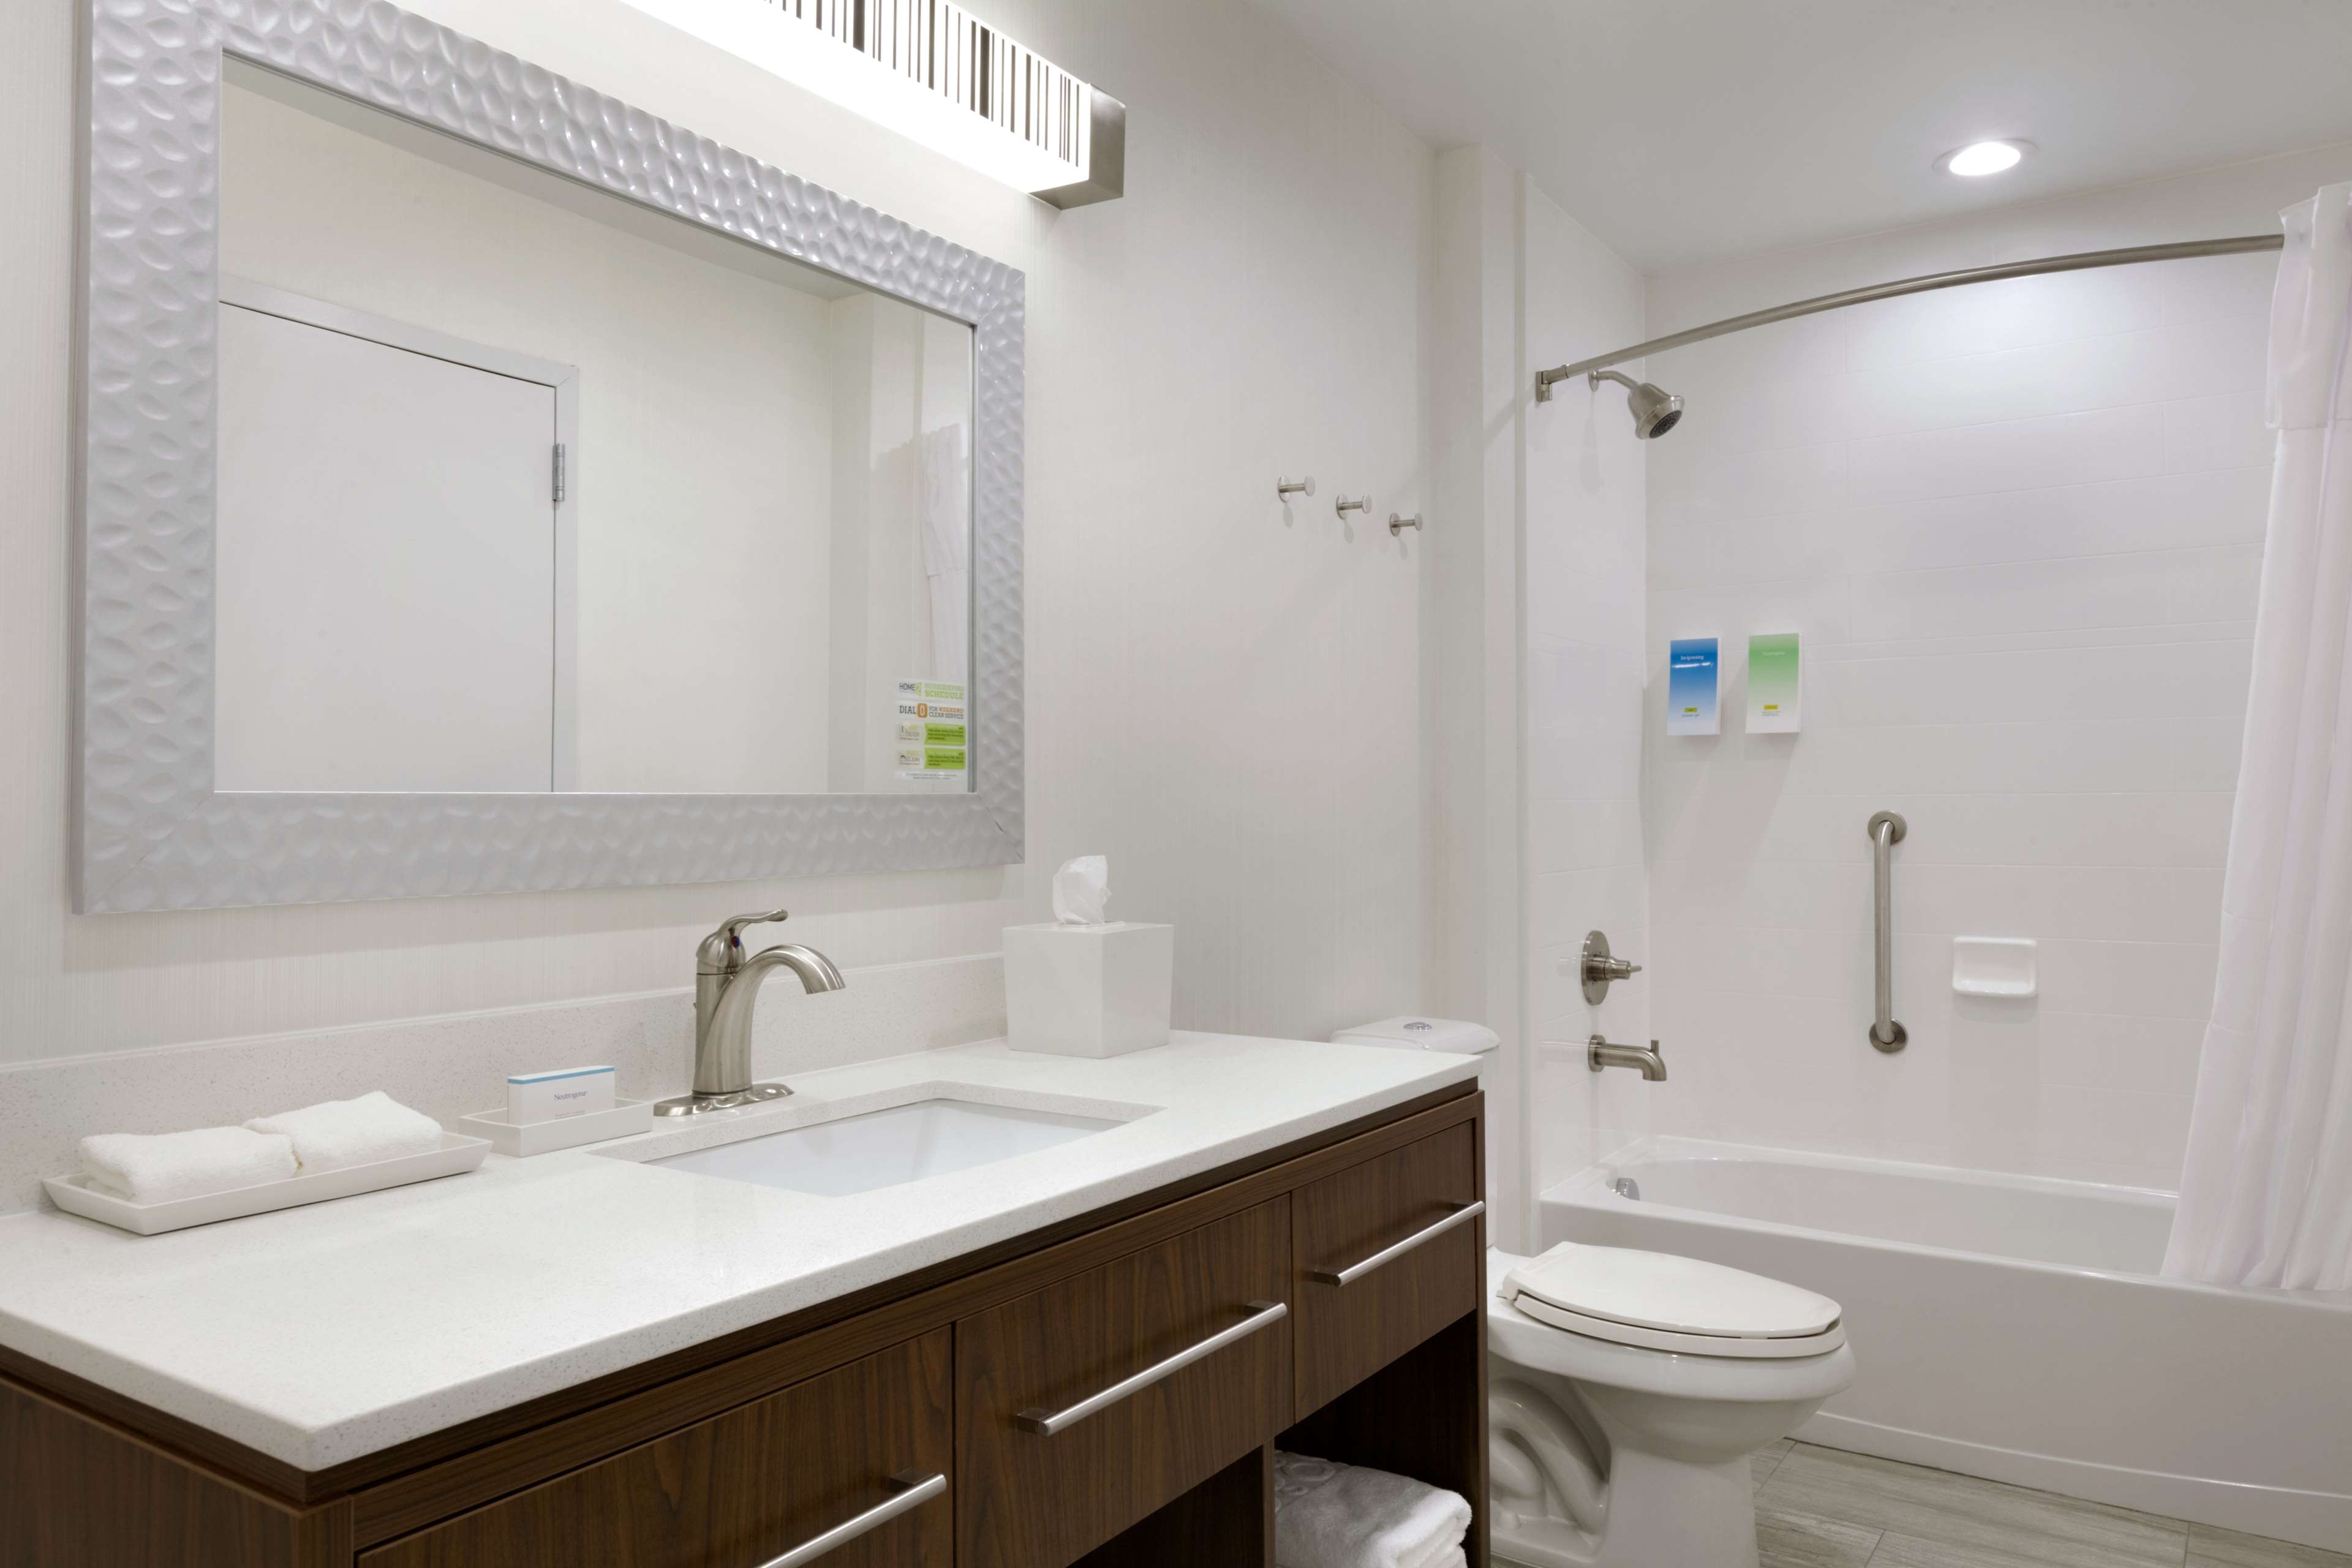 Home2 Suites by Hilton West Monroe image 13